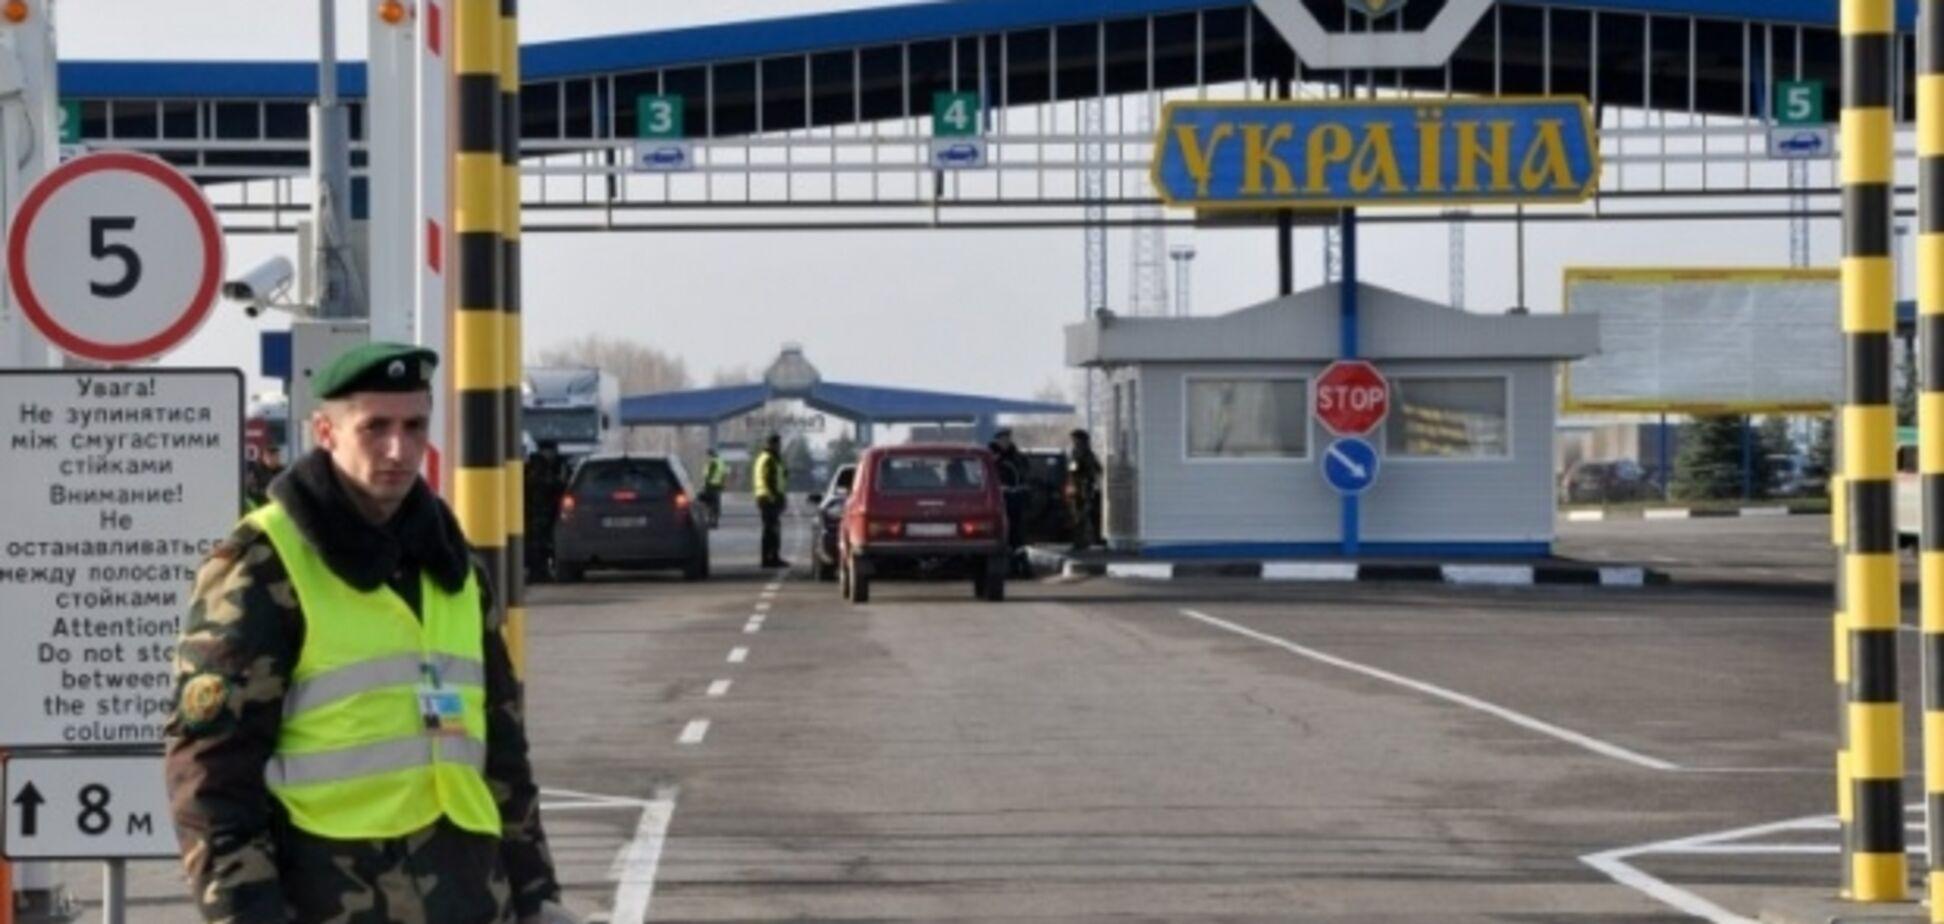 Украина запретила въезд мужчинам-россиянам: все подробности